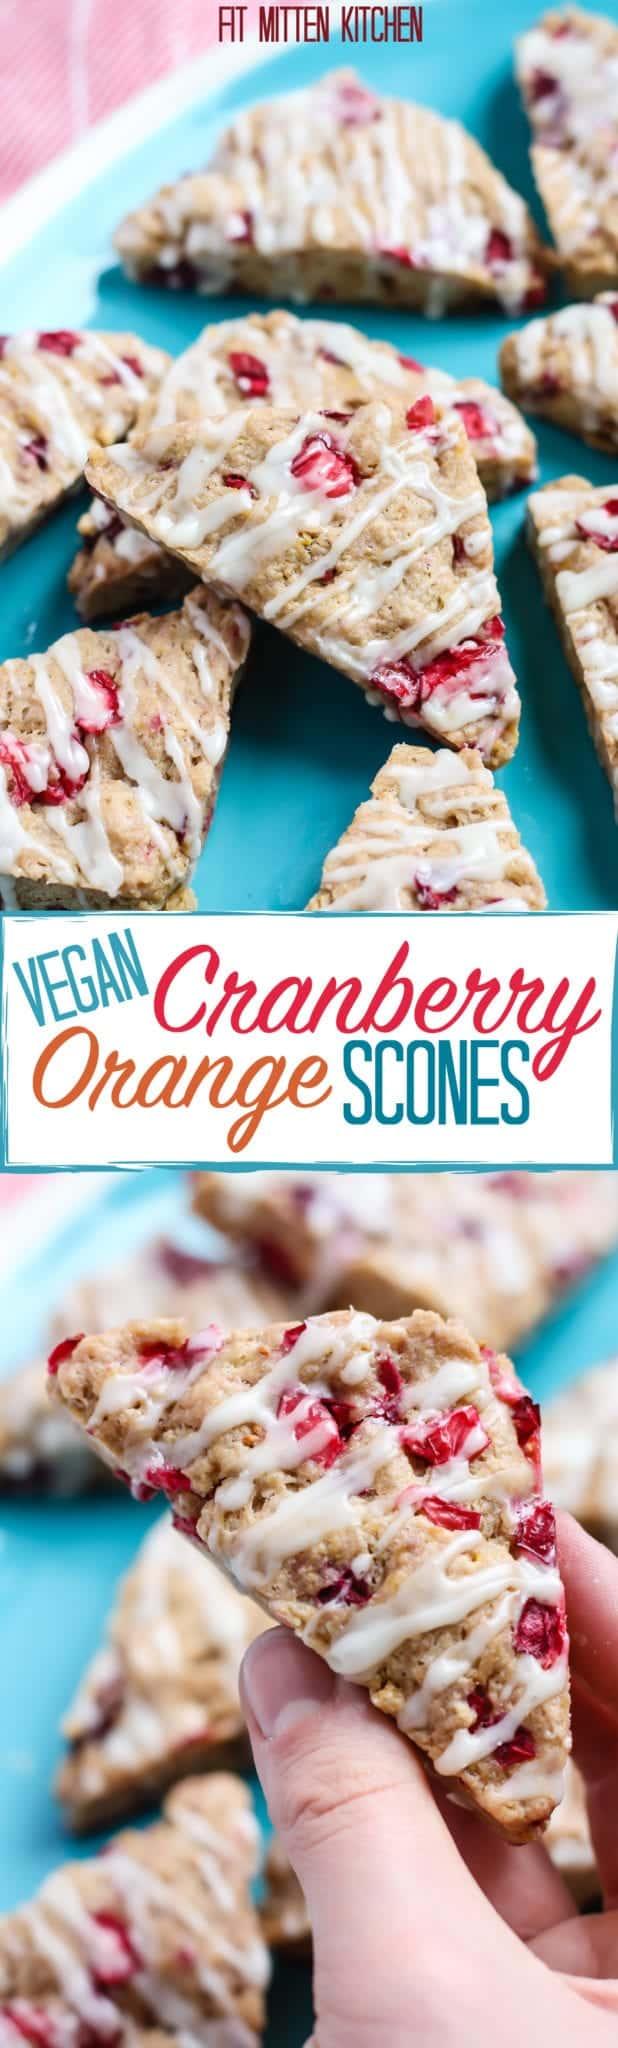 Vegan Cranberry Orange Scones on turquoise plate